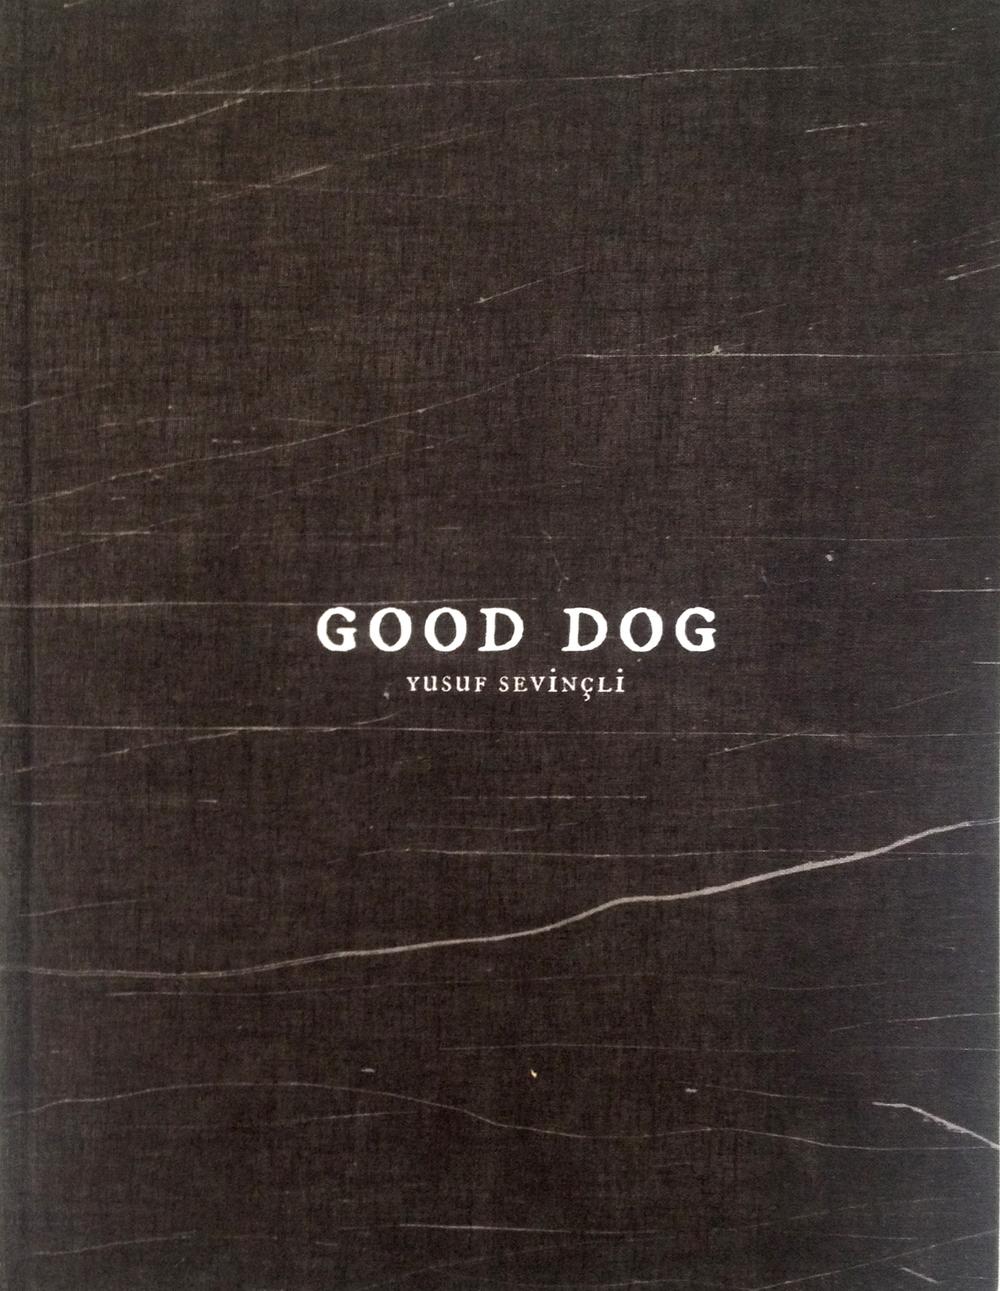 YUSUF SEVINÇLI - Good Dog.jpg